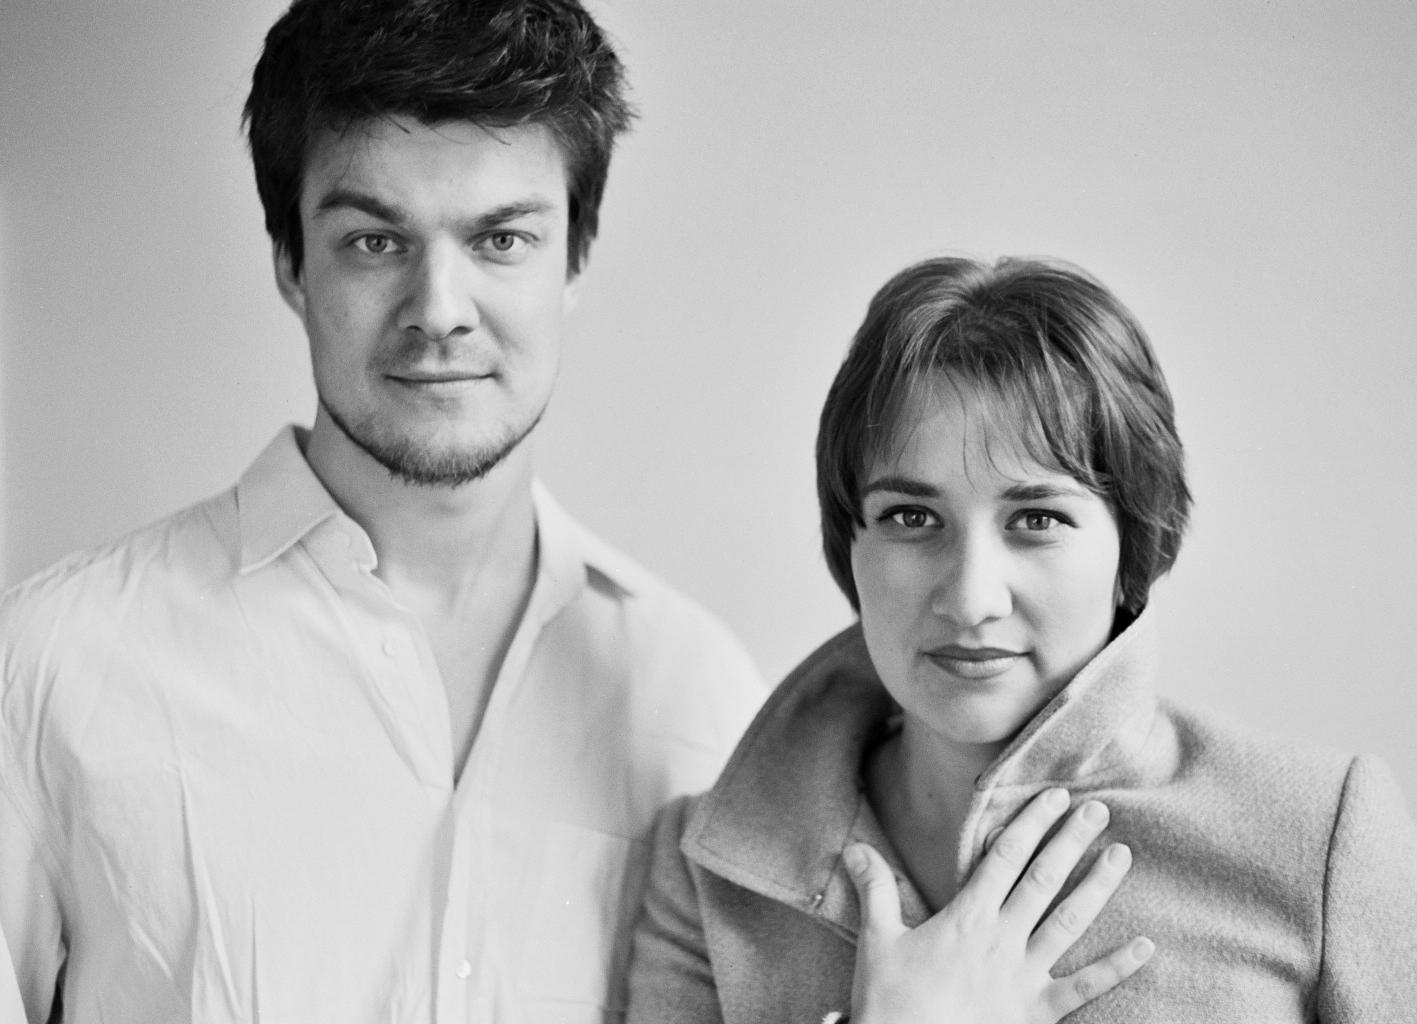 Karolina Trybala und Lars Stoermer